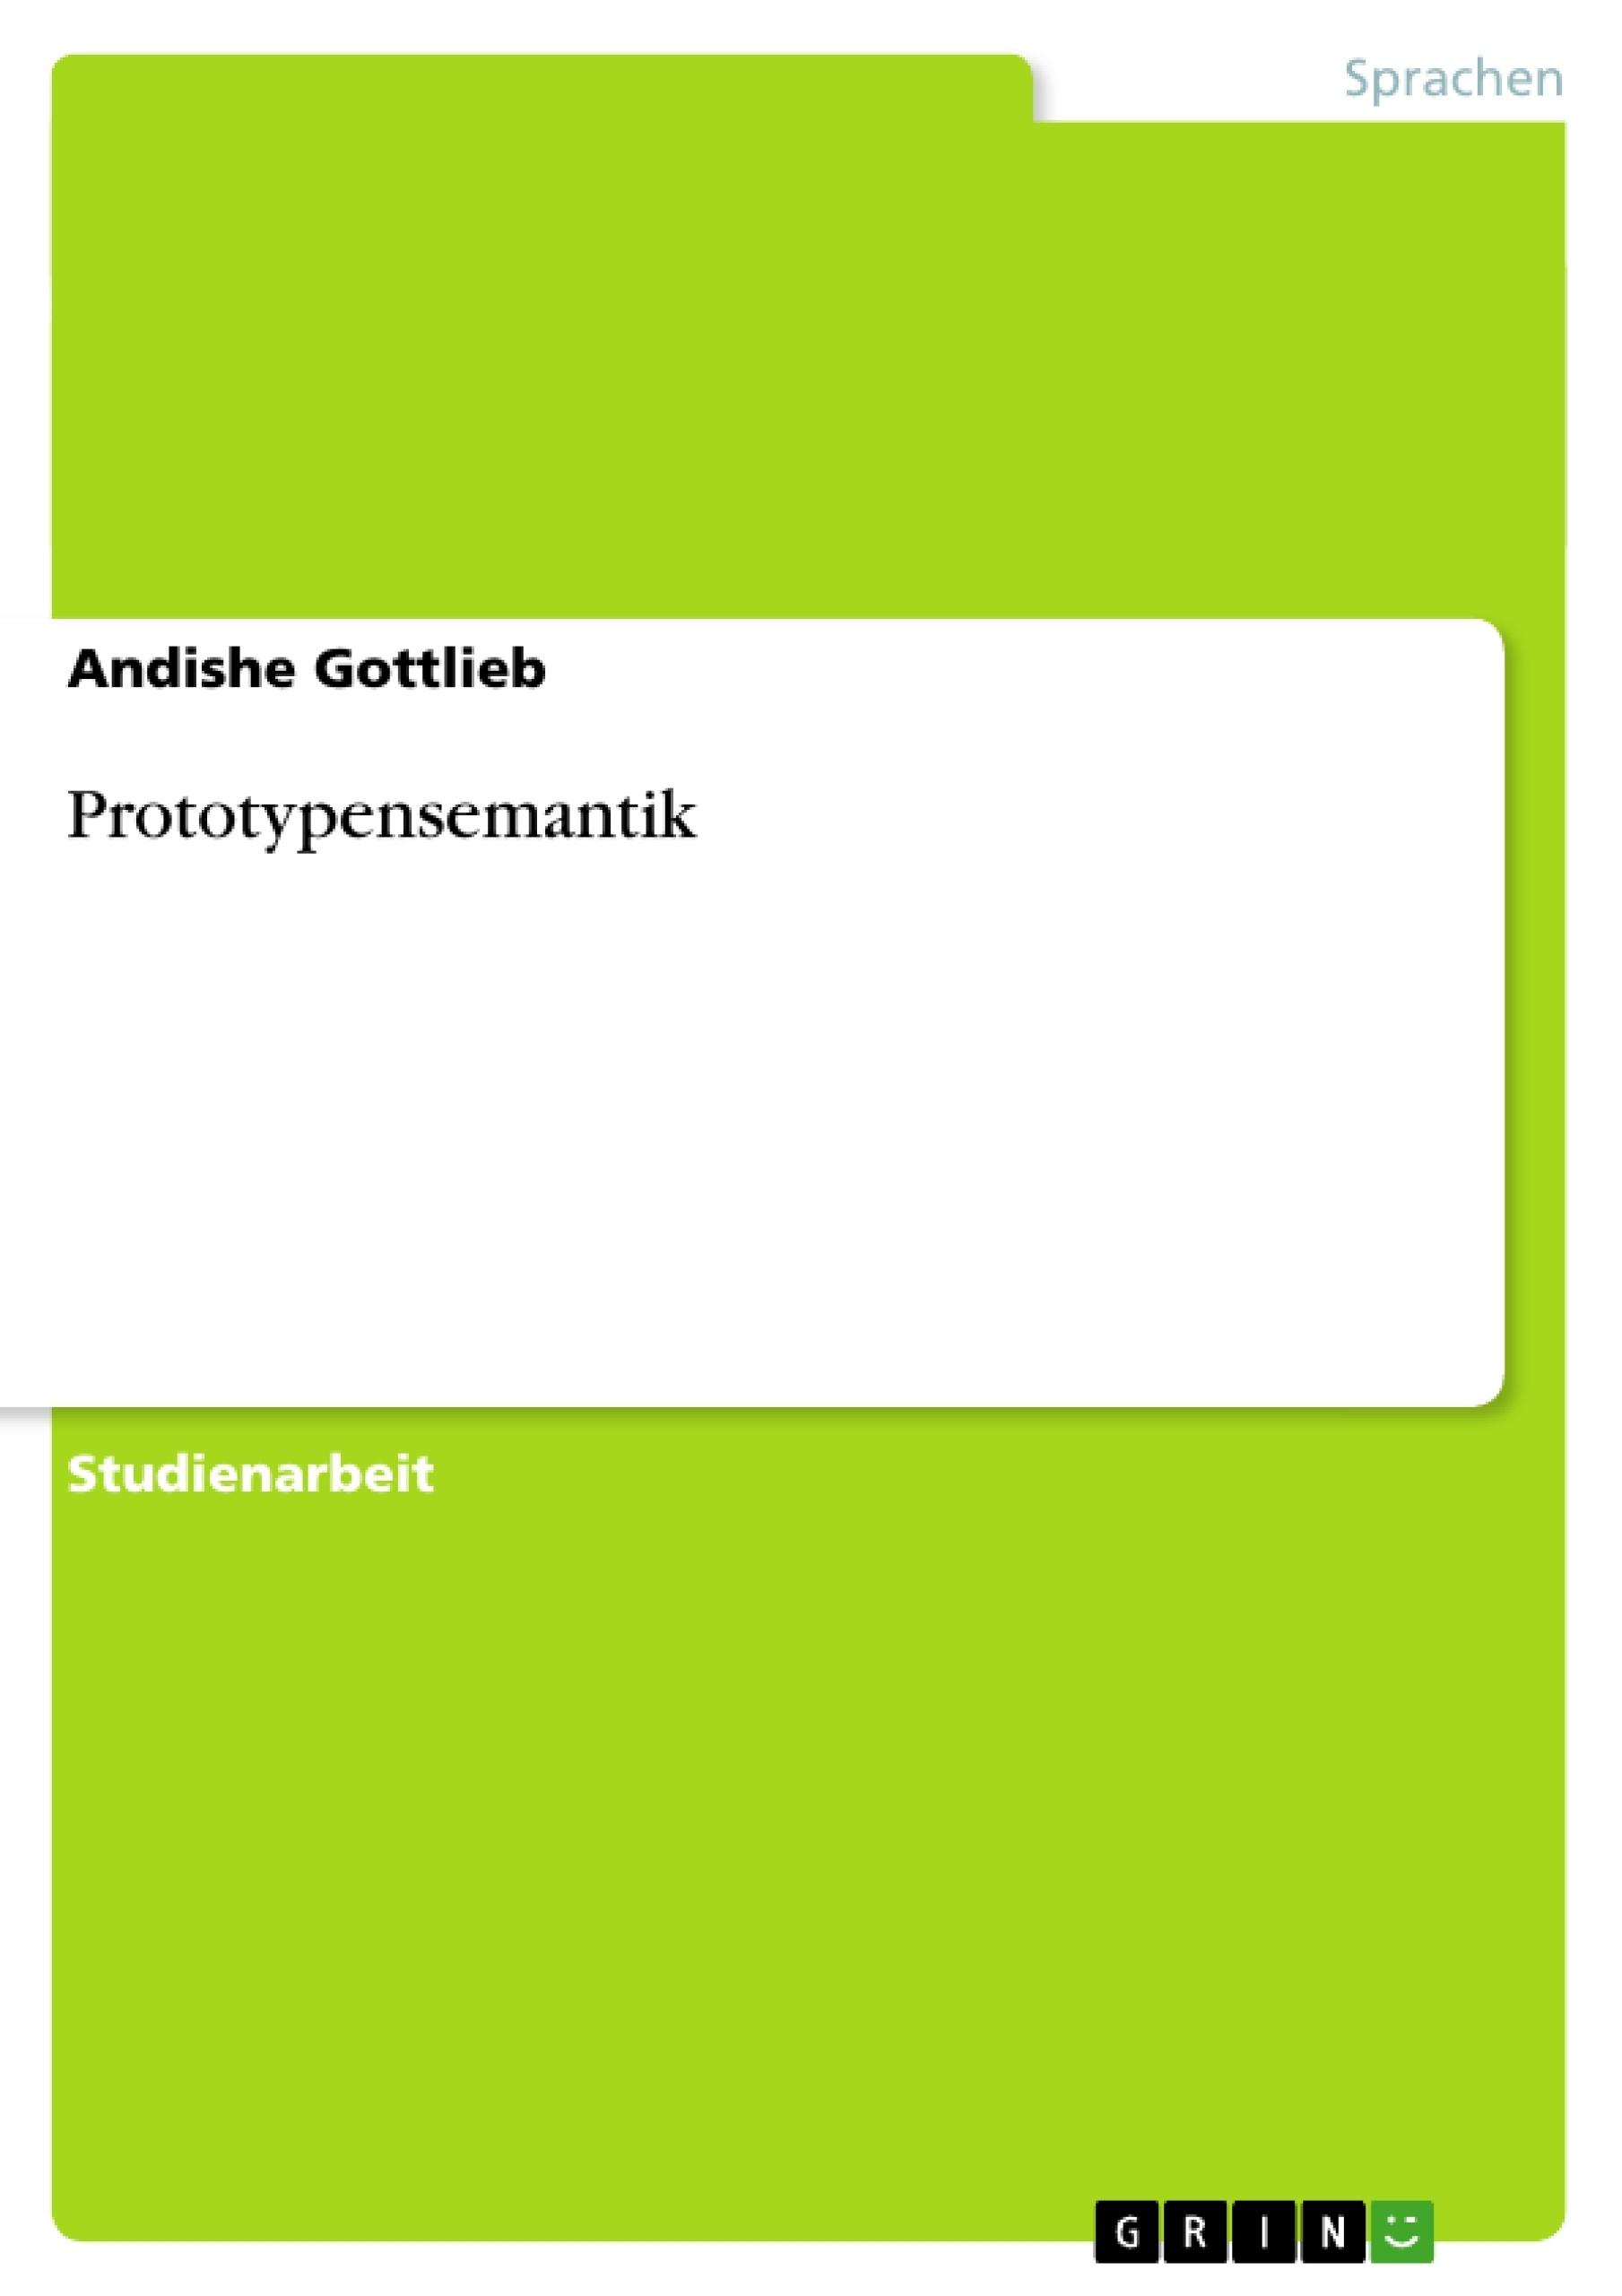 Titel: Prototypensemantik